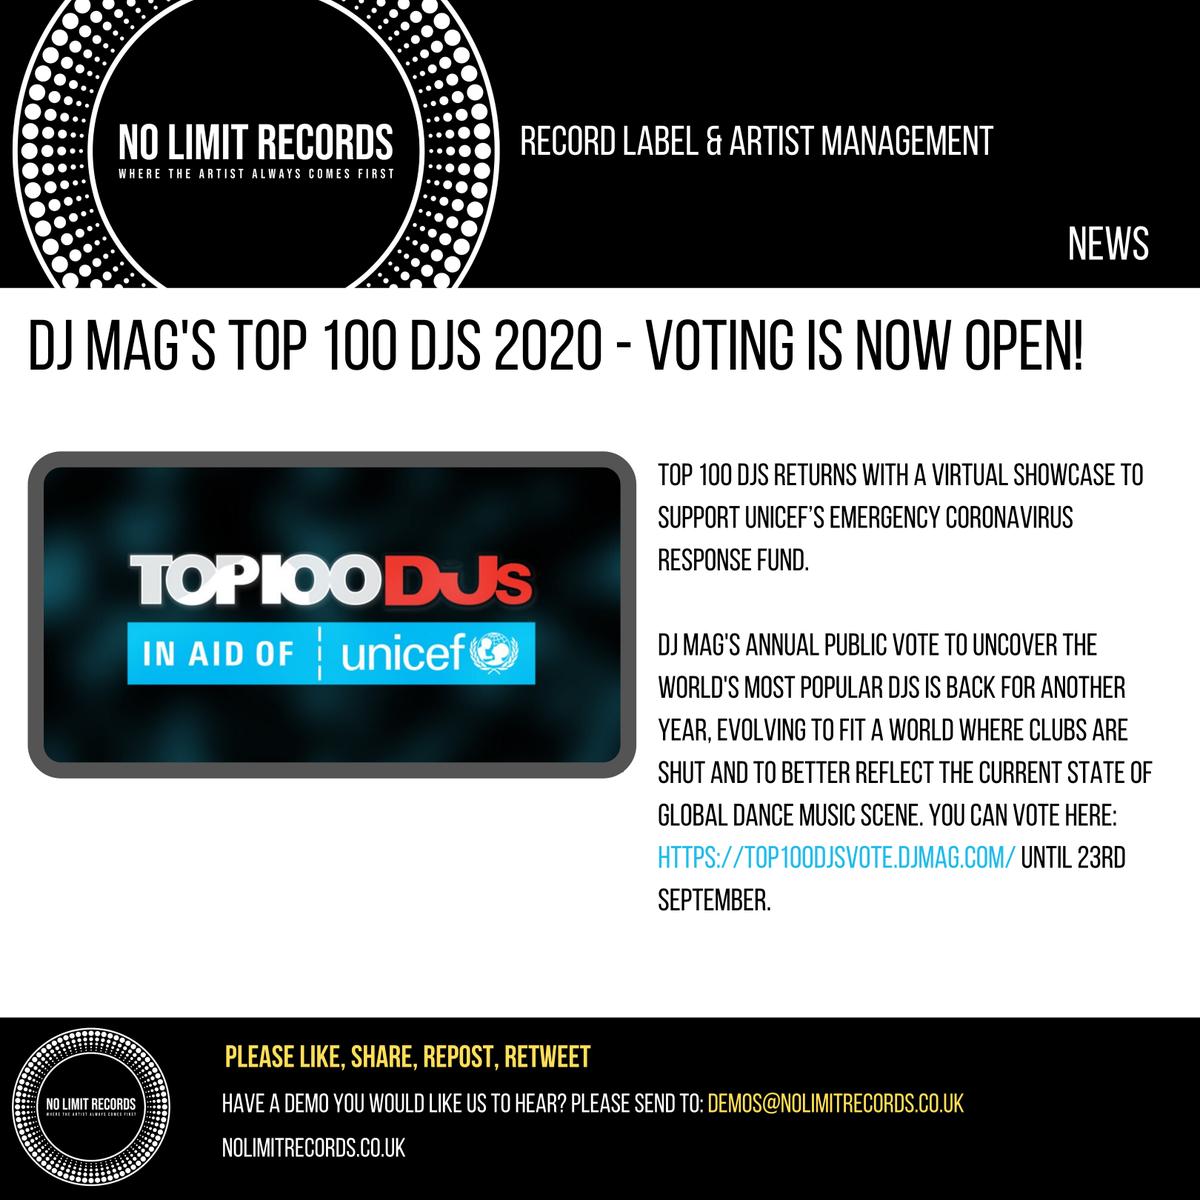 DJ Mag's TOP 100 DJS 2020 - VOTING IS NOW OPEN!  You can vote here:  until 23rd September 🔊🔥🔥  @DJmag @UNICEF   #femaleproducerdjs #djlife #techouse #clubbing #rave #technoproducer #technoproducers #technoartist #ukhouseproducers #techhousemusic